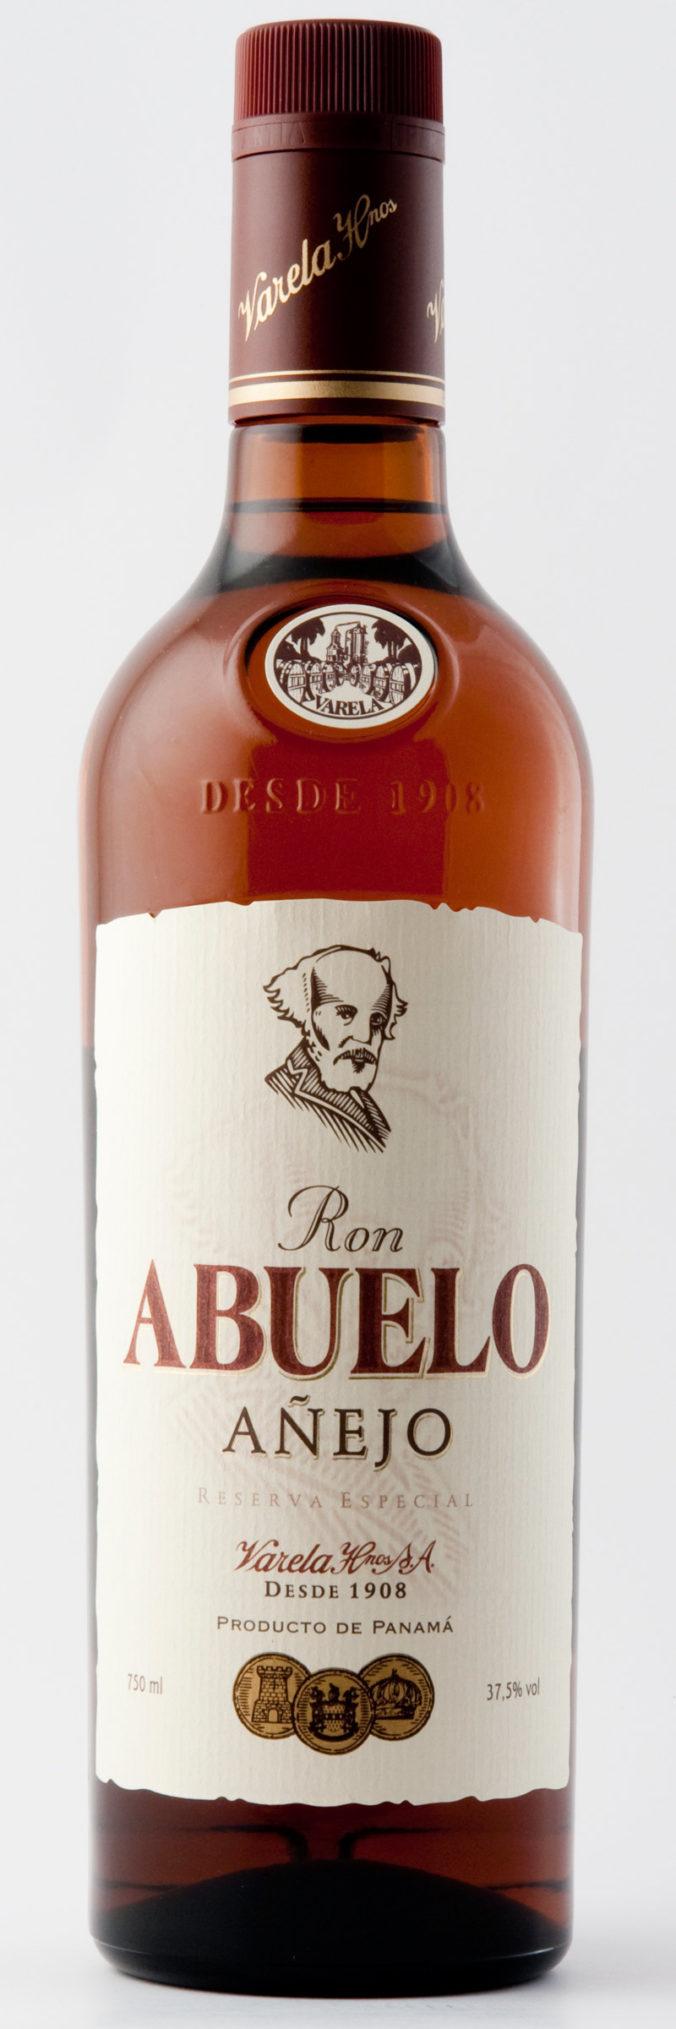 Abuelo Añjeo aged rum from Panama